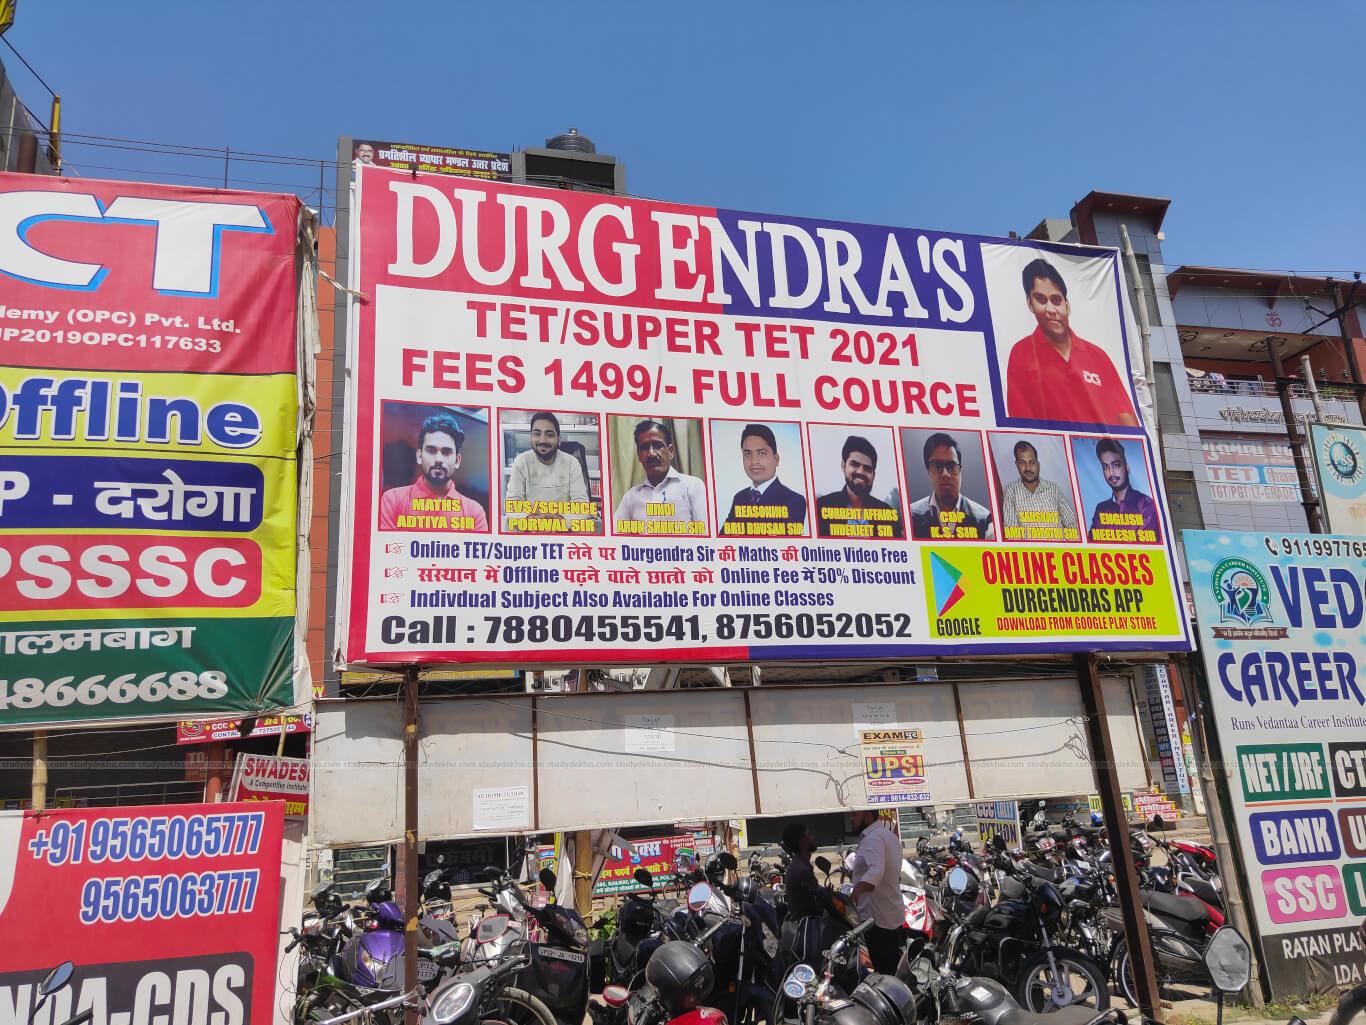 DURGENDRA  CLASSES Logo